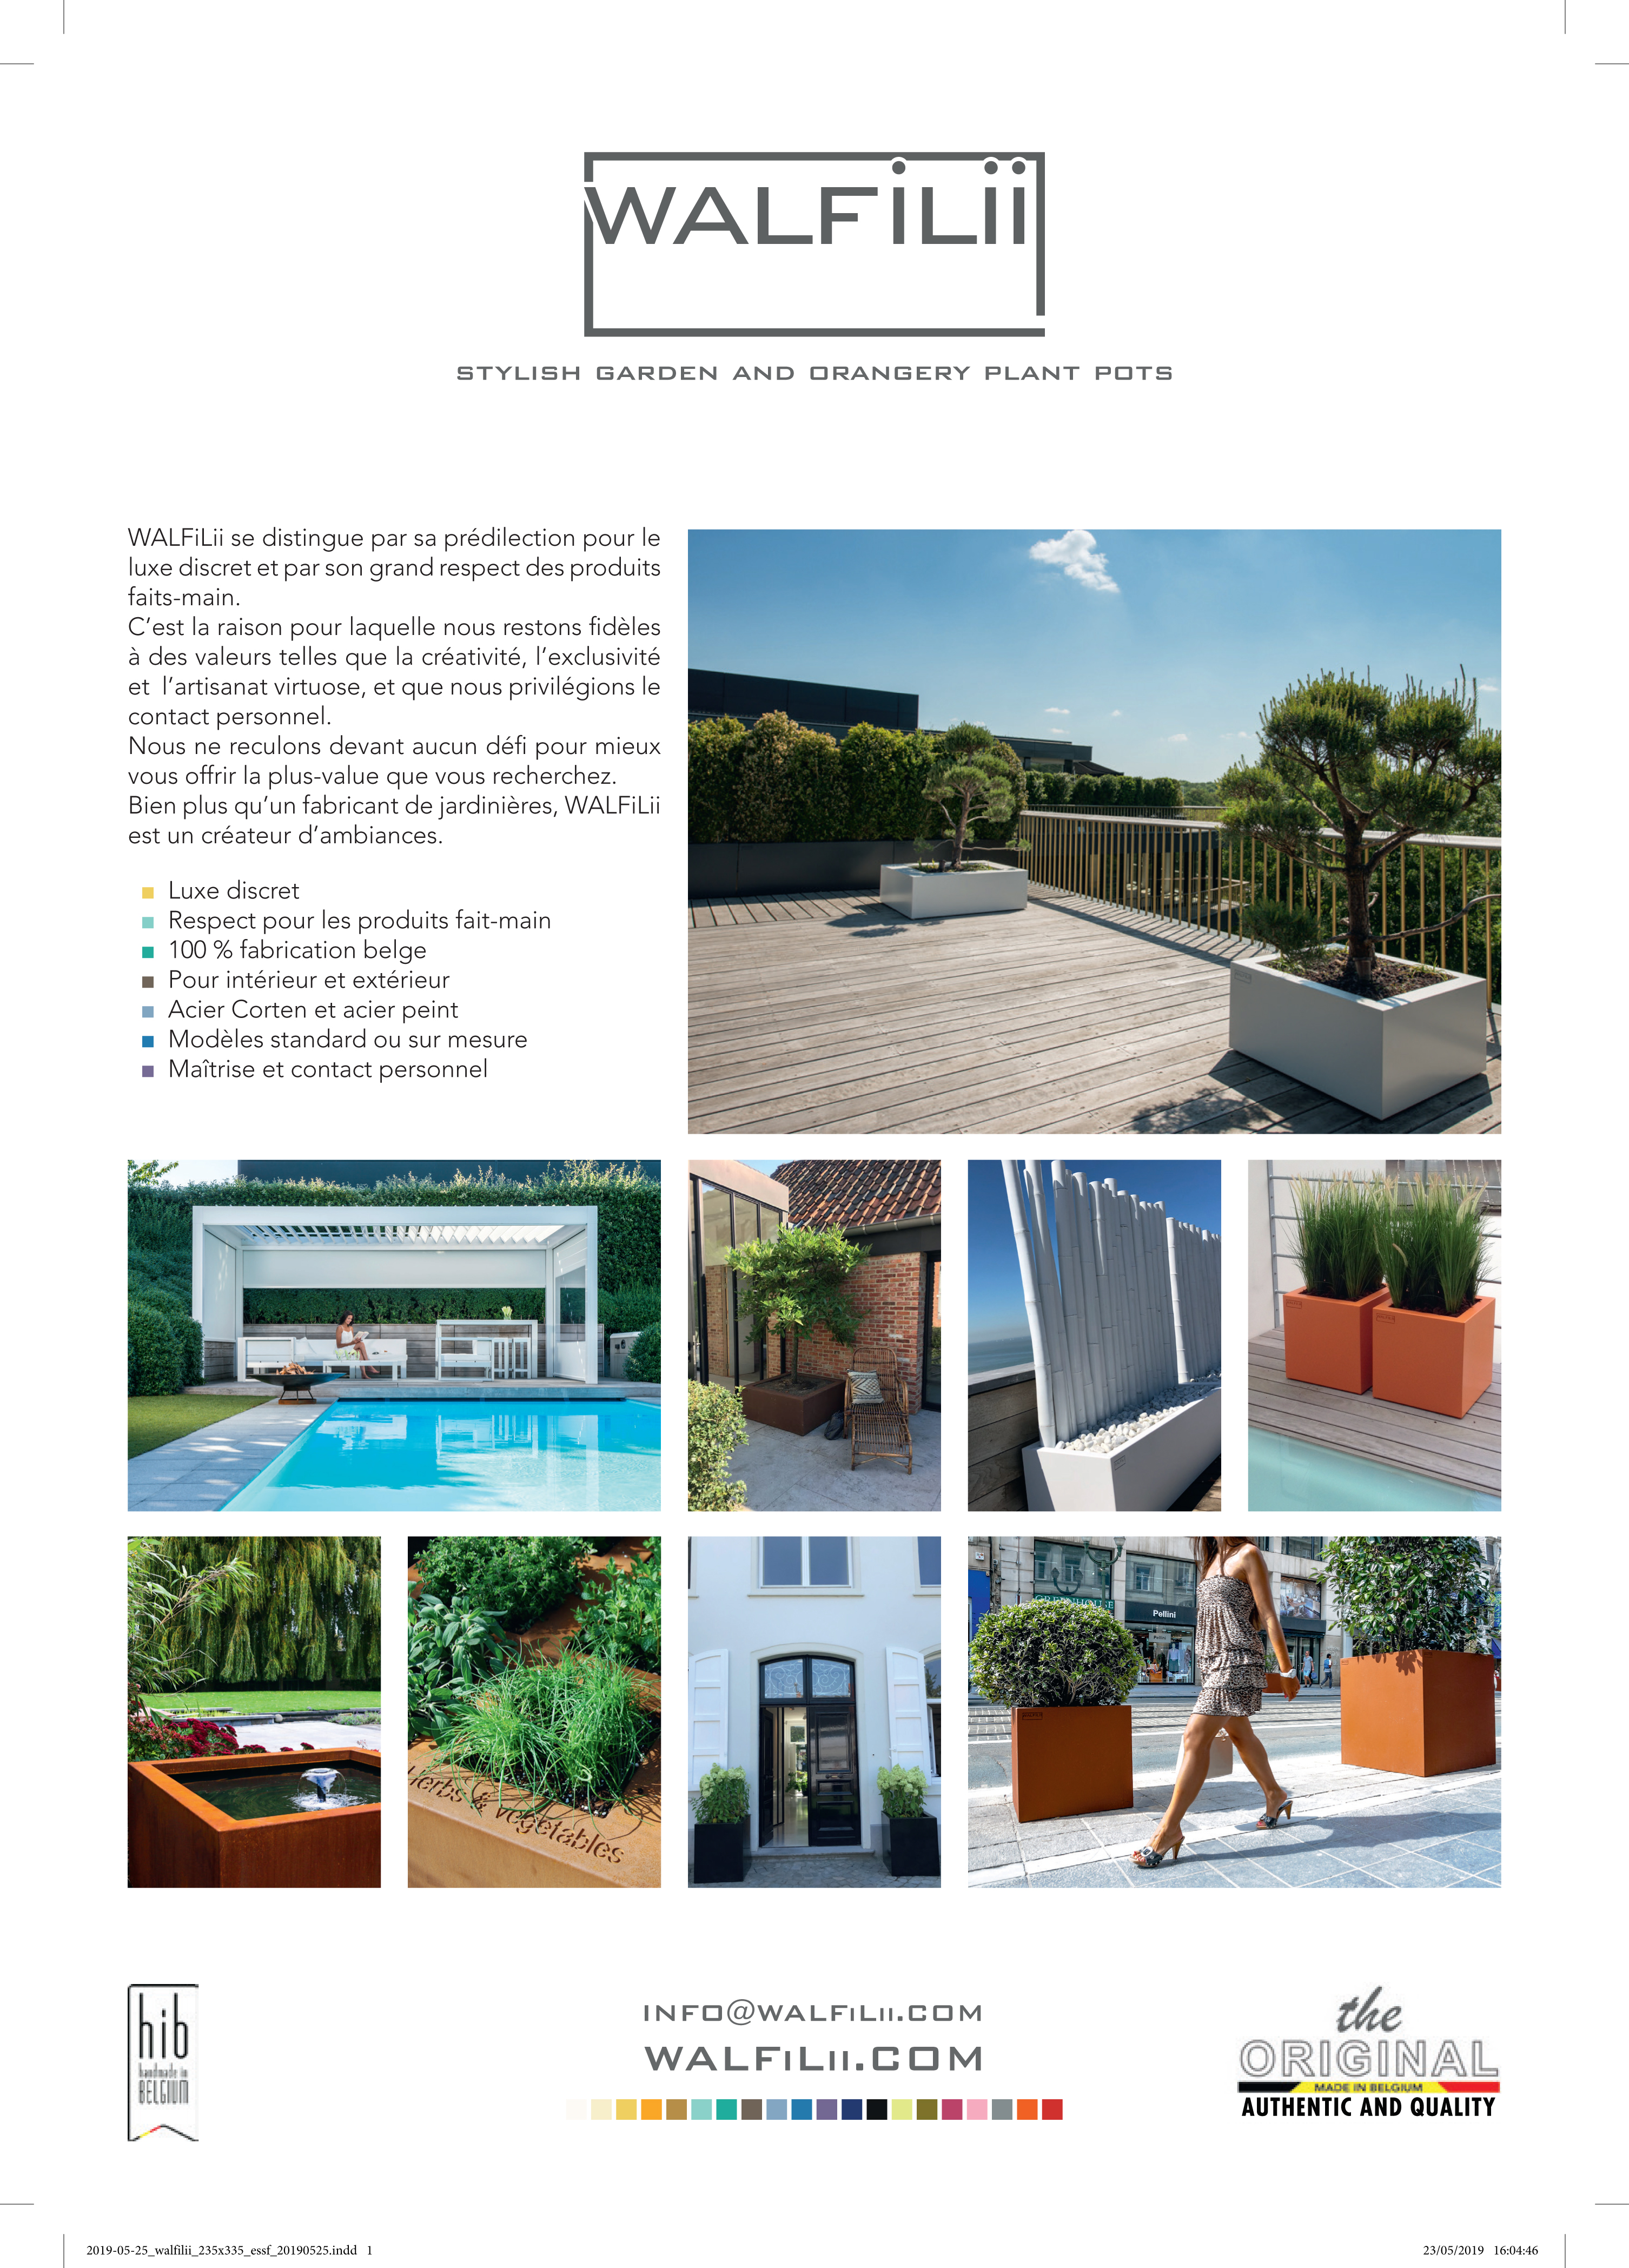 WALFiLii in de pers Focus Essentiel magazine